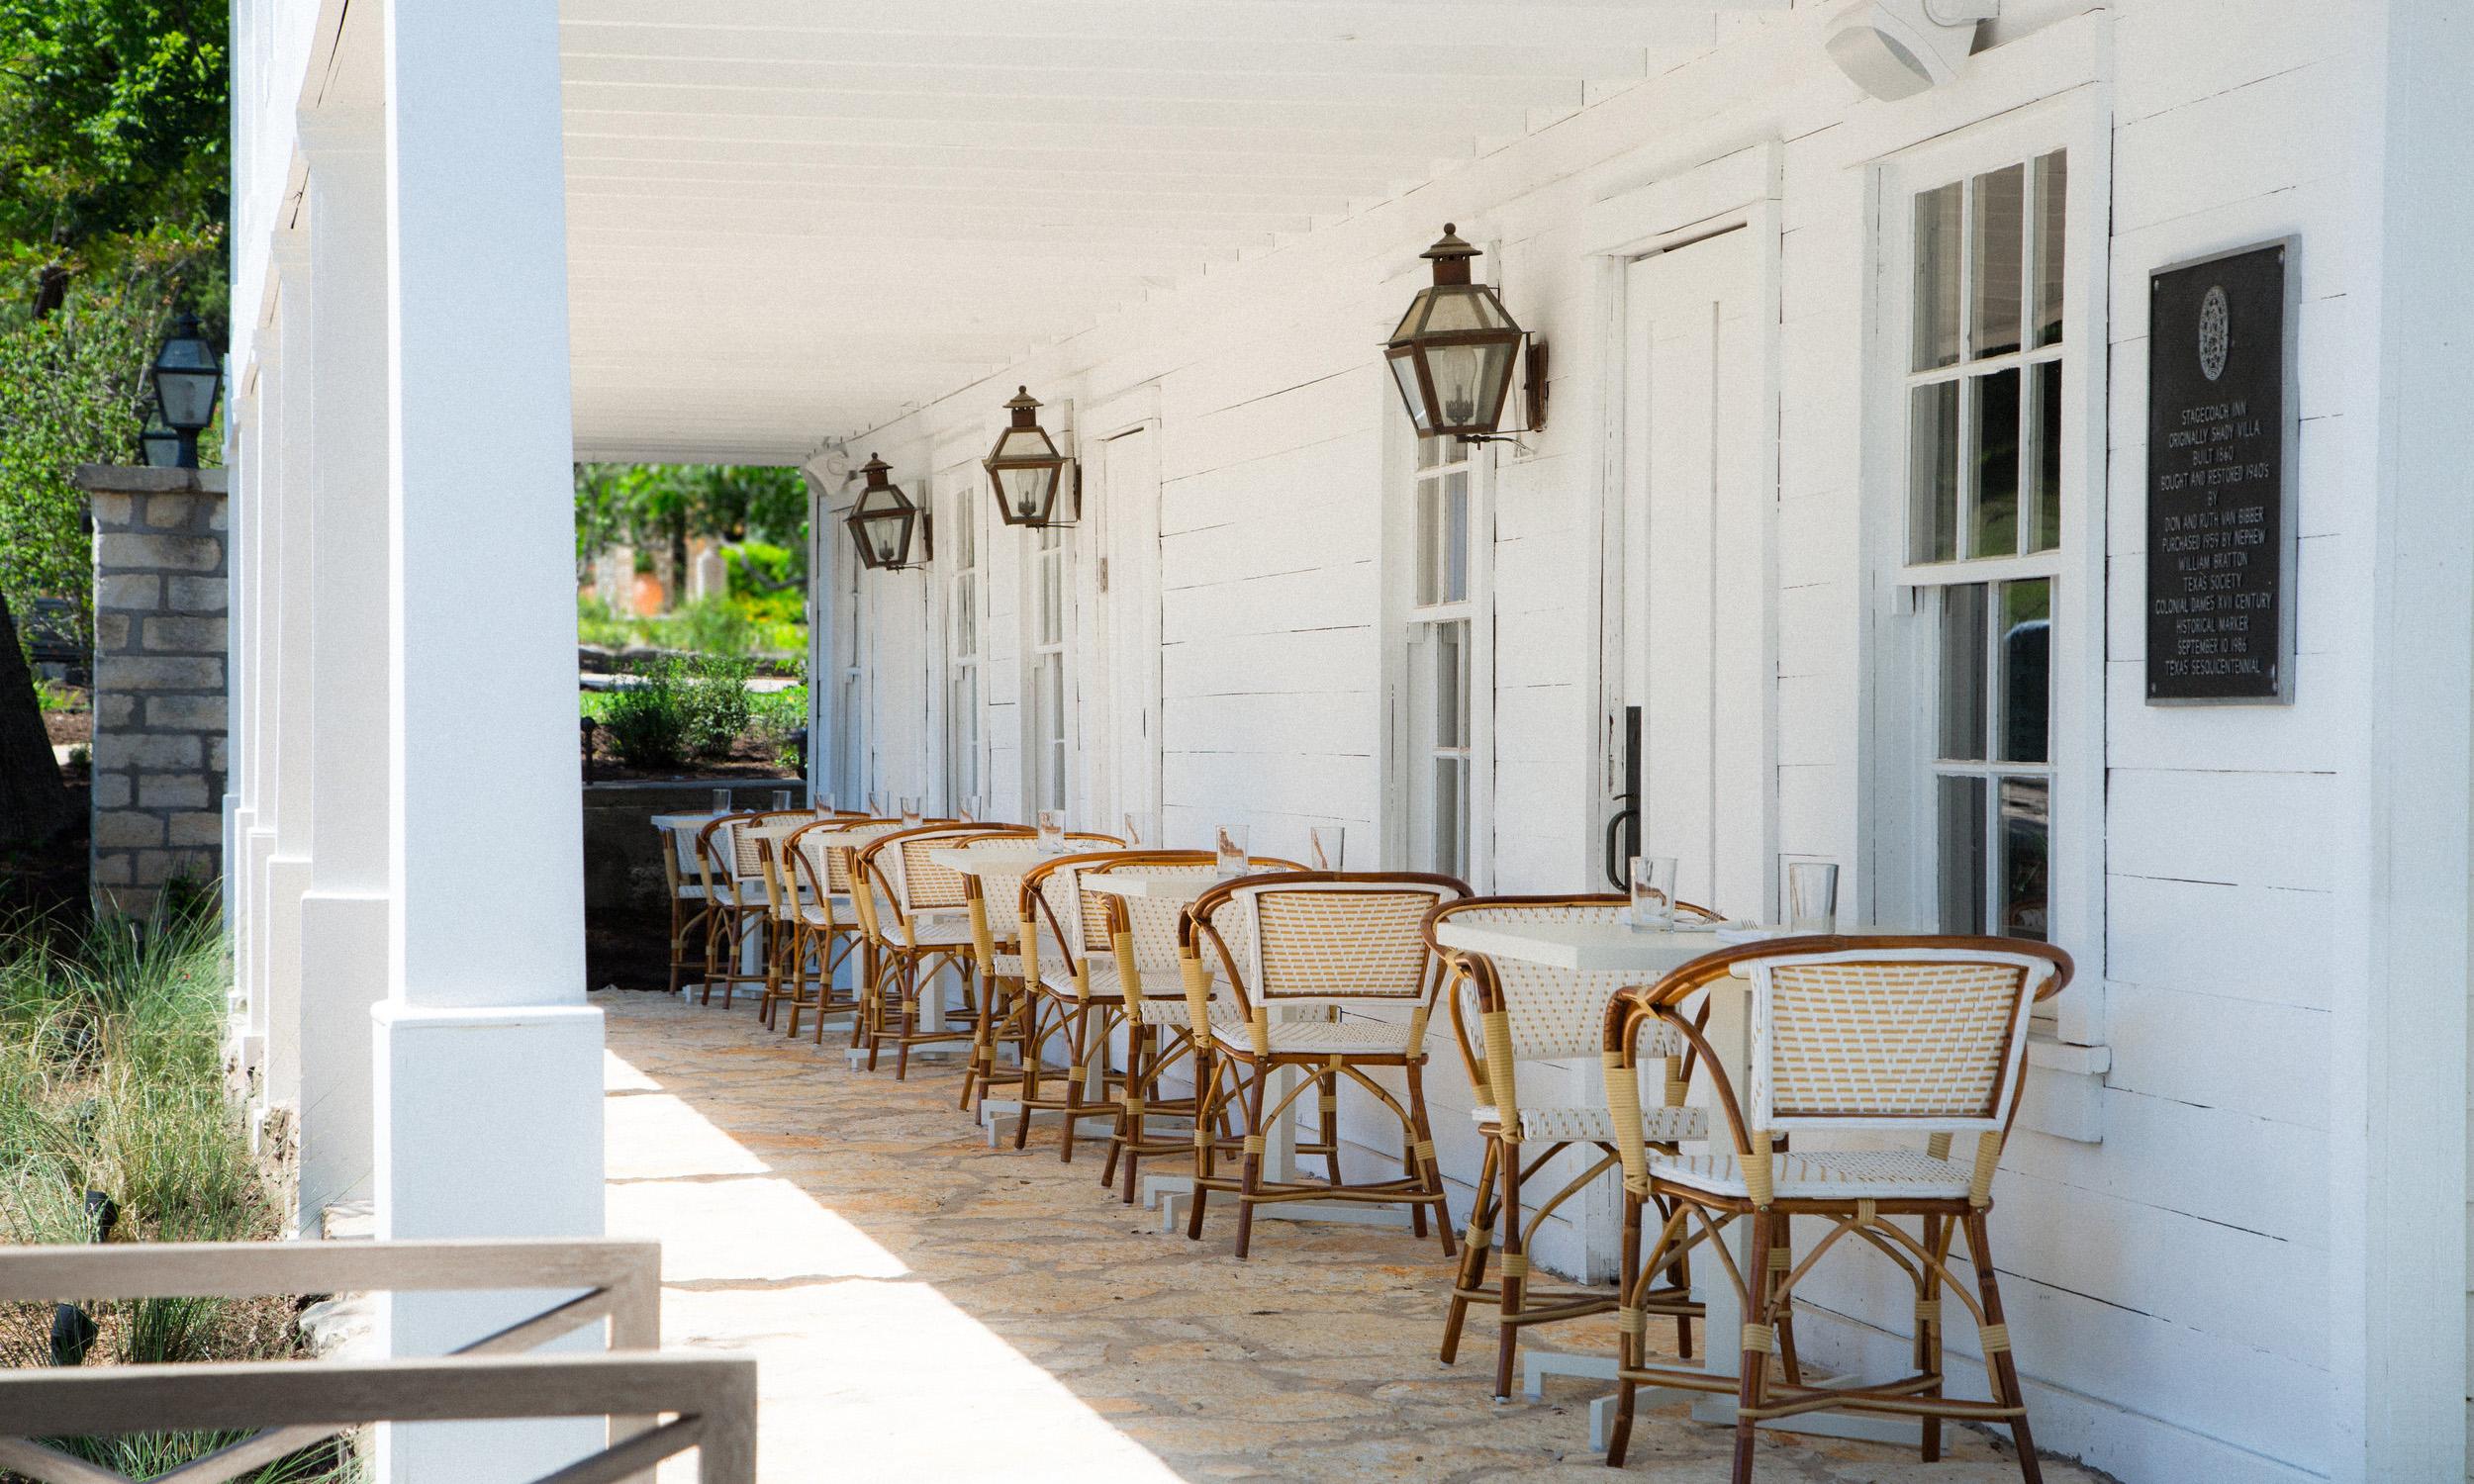 Stagecoach+Inn_patio-chairs-contact.jpg